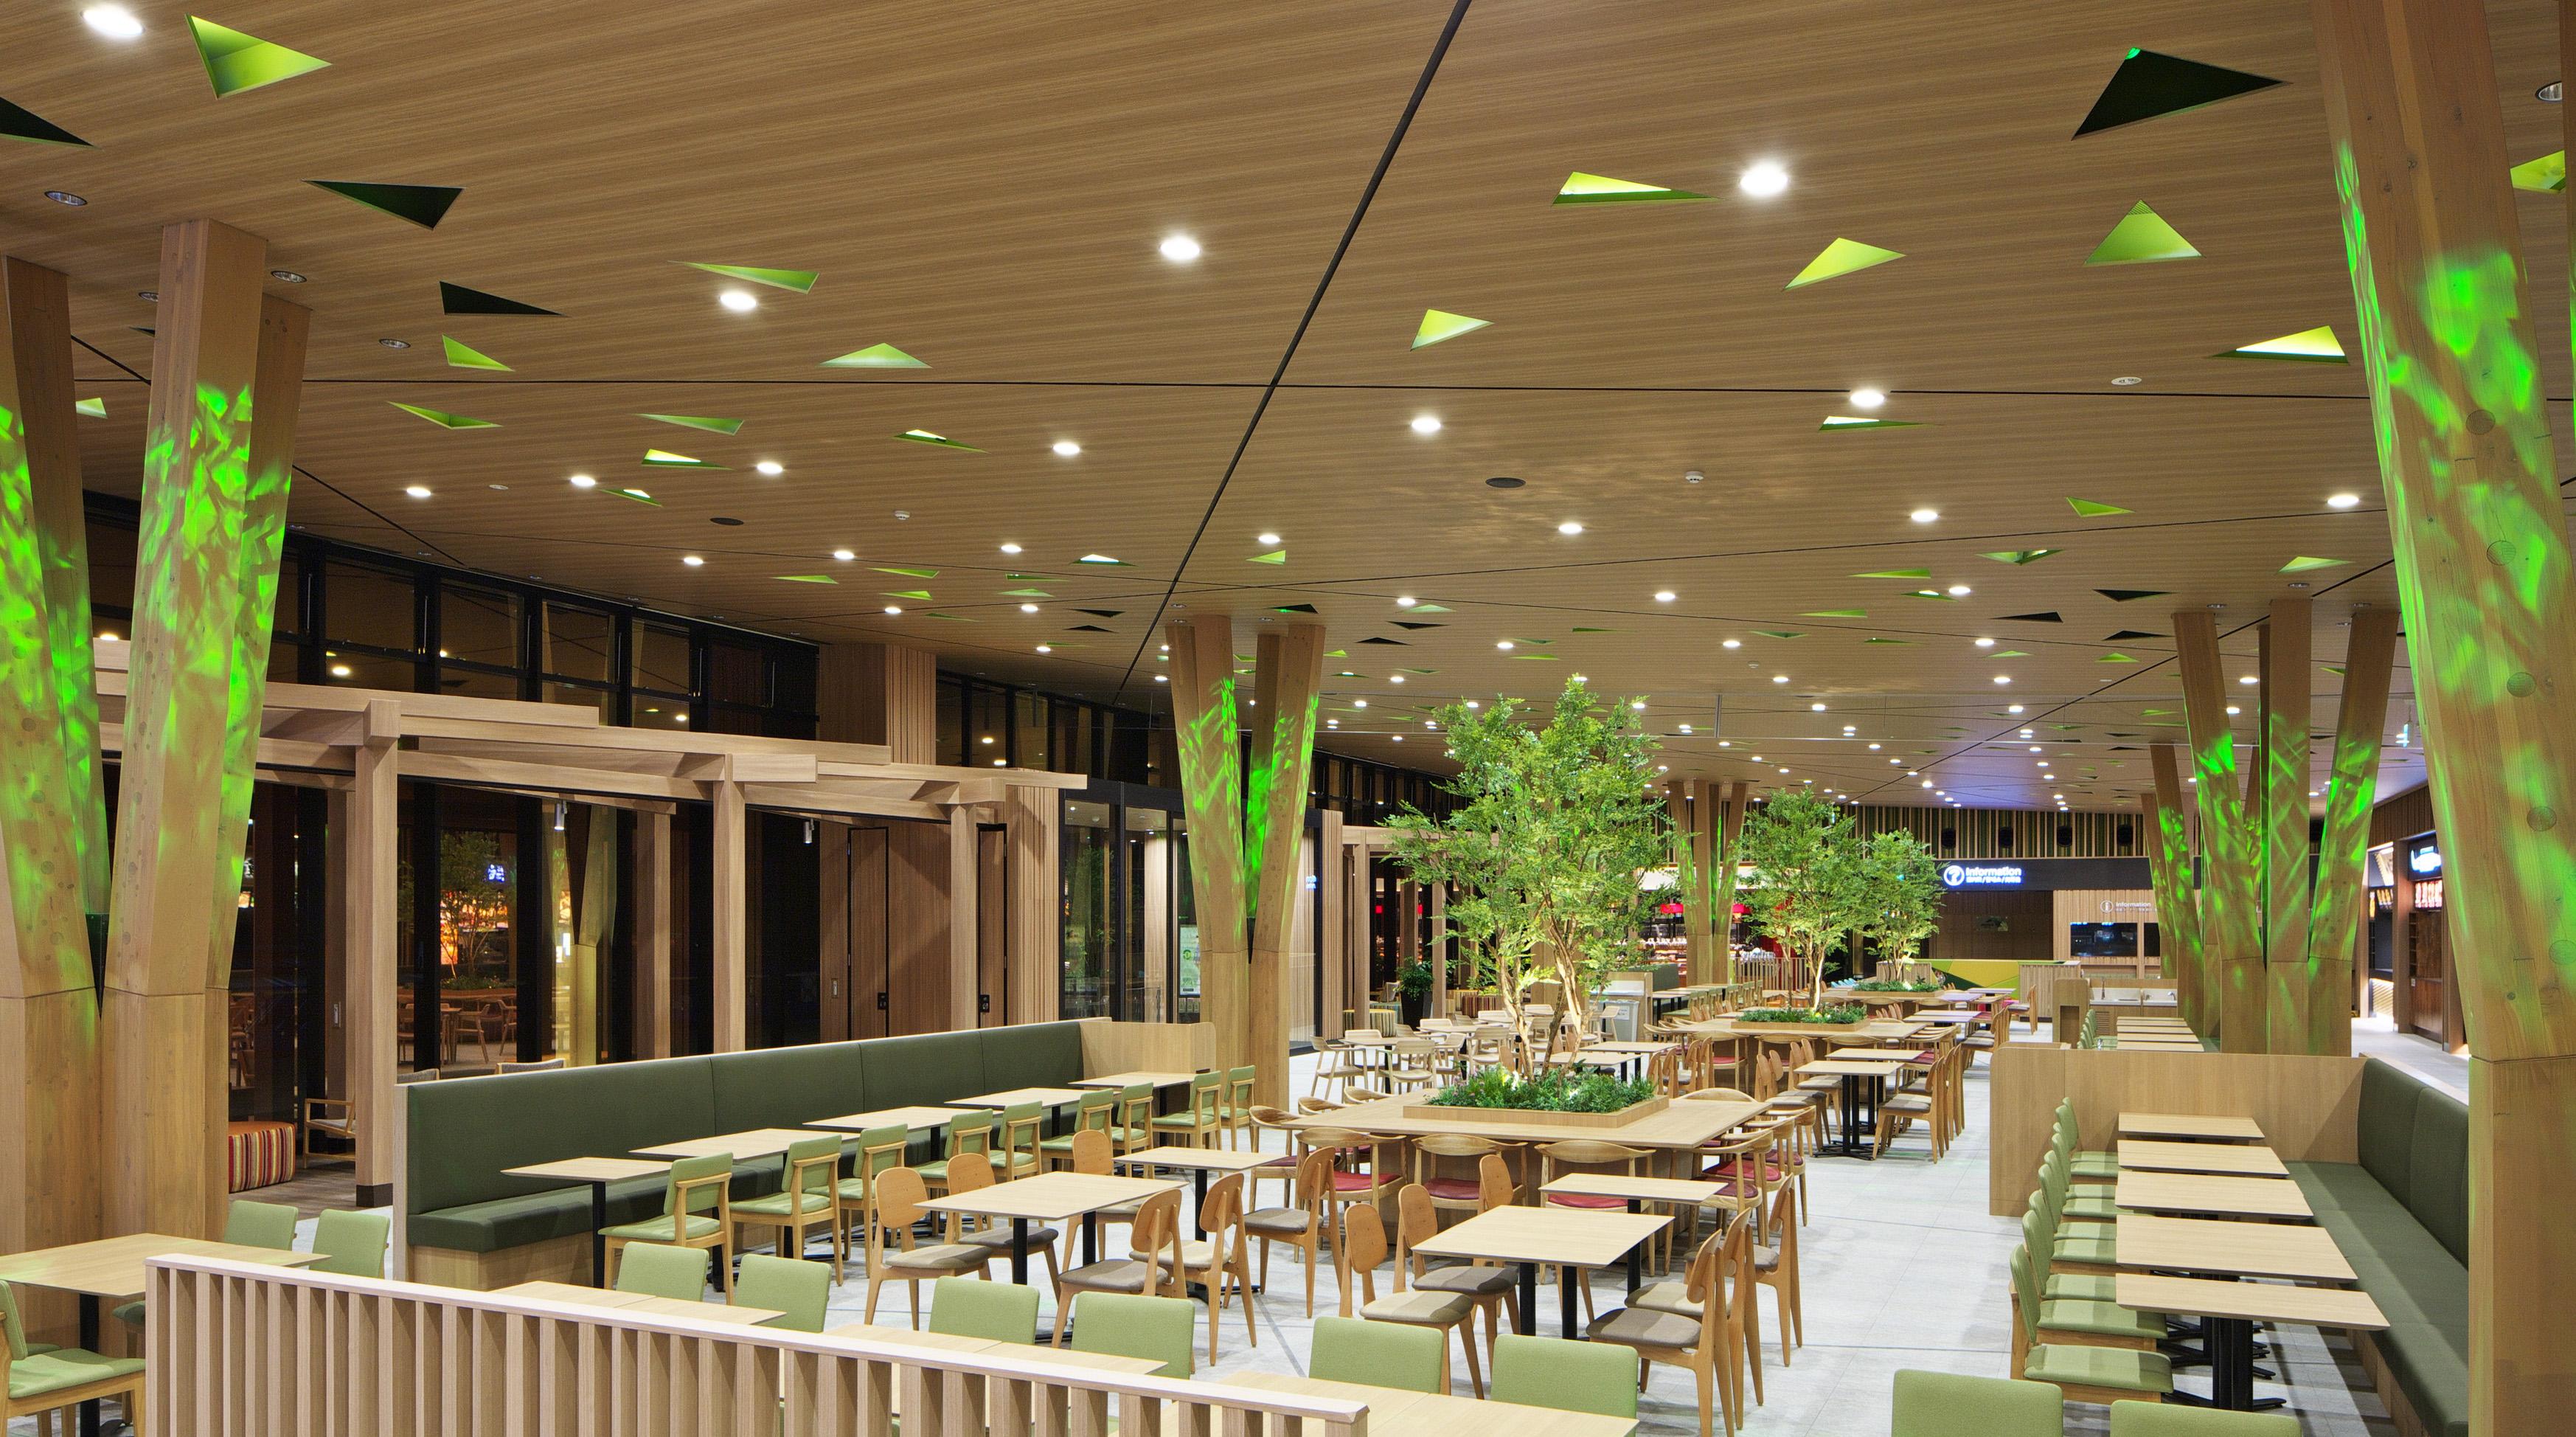 常磐自動車道 守谷SA(上り線)商業施設新築工事(内観)イメージ